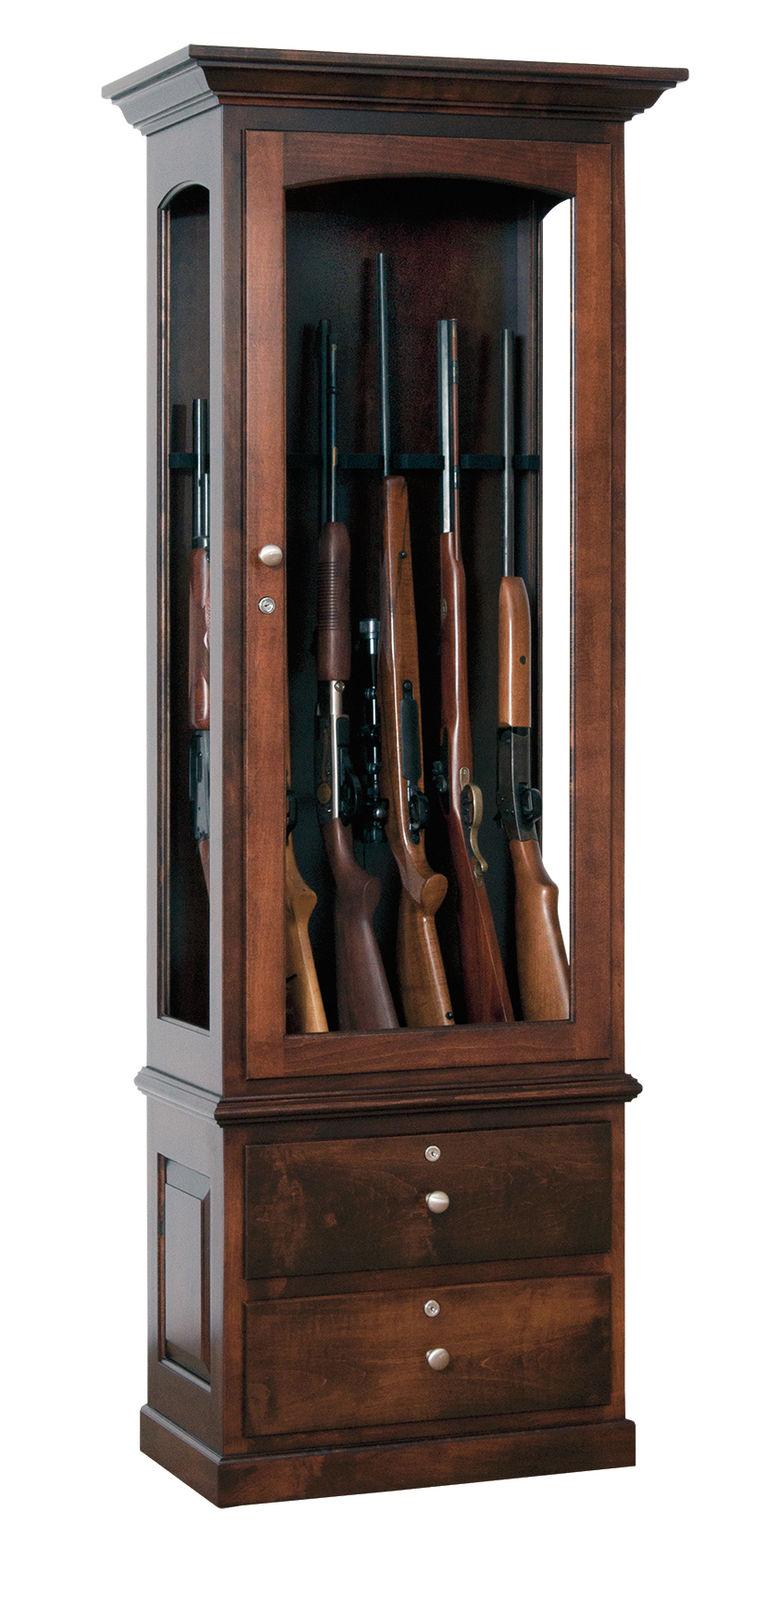 Photo of: JSW 6 Gun Cabinet W/ Drawers